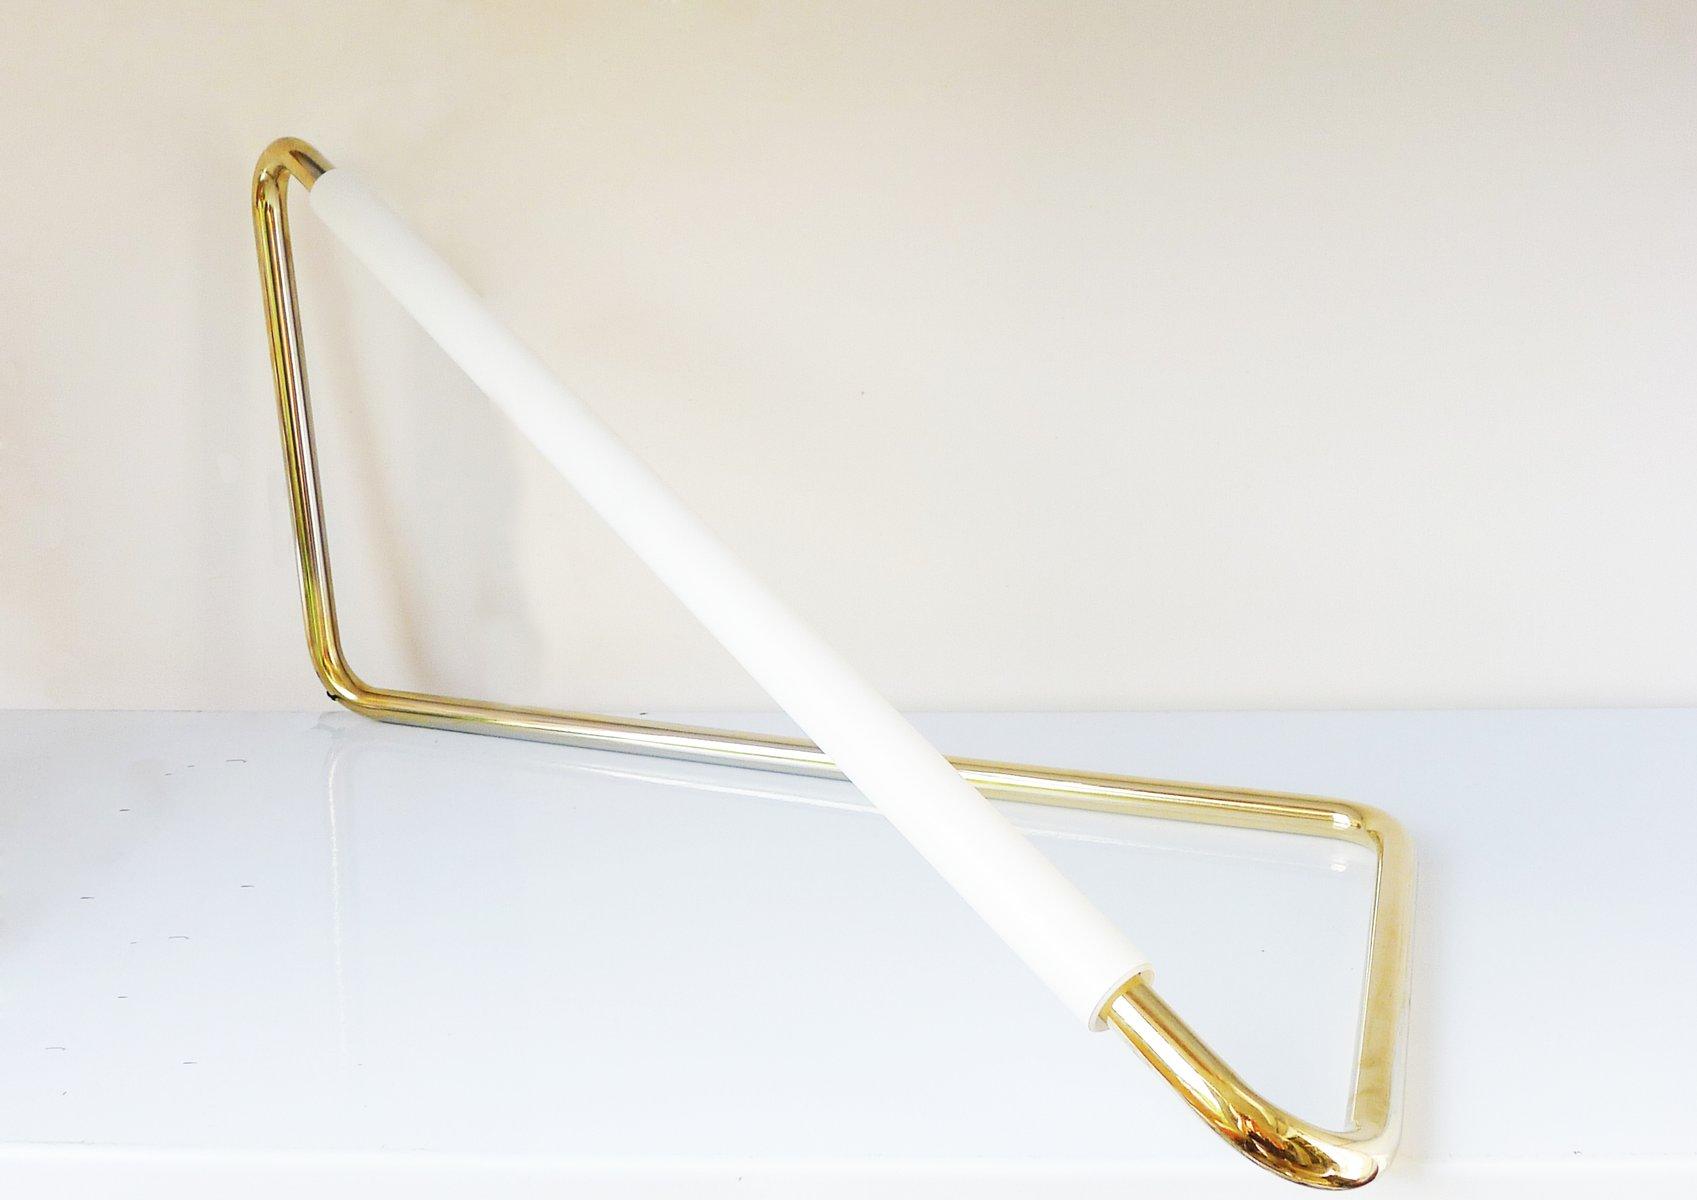 Gold Light Object 001 von Naama Hofman